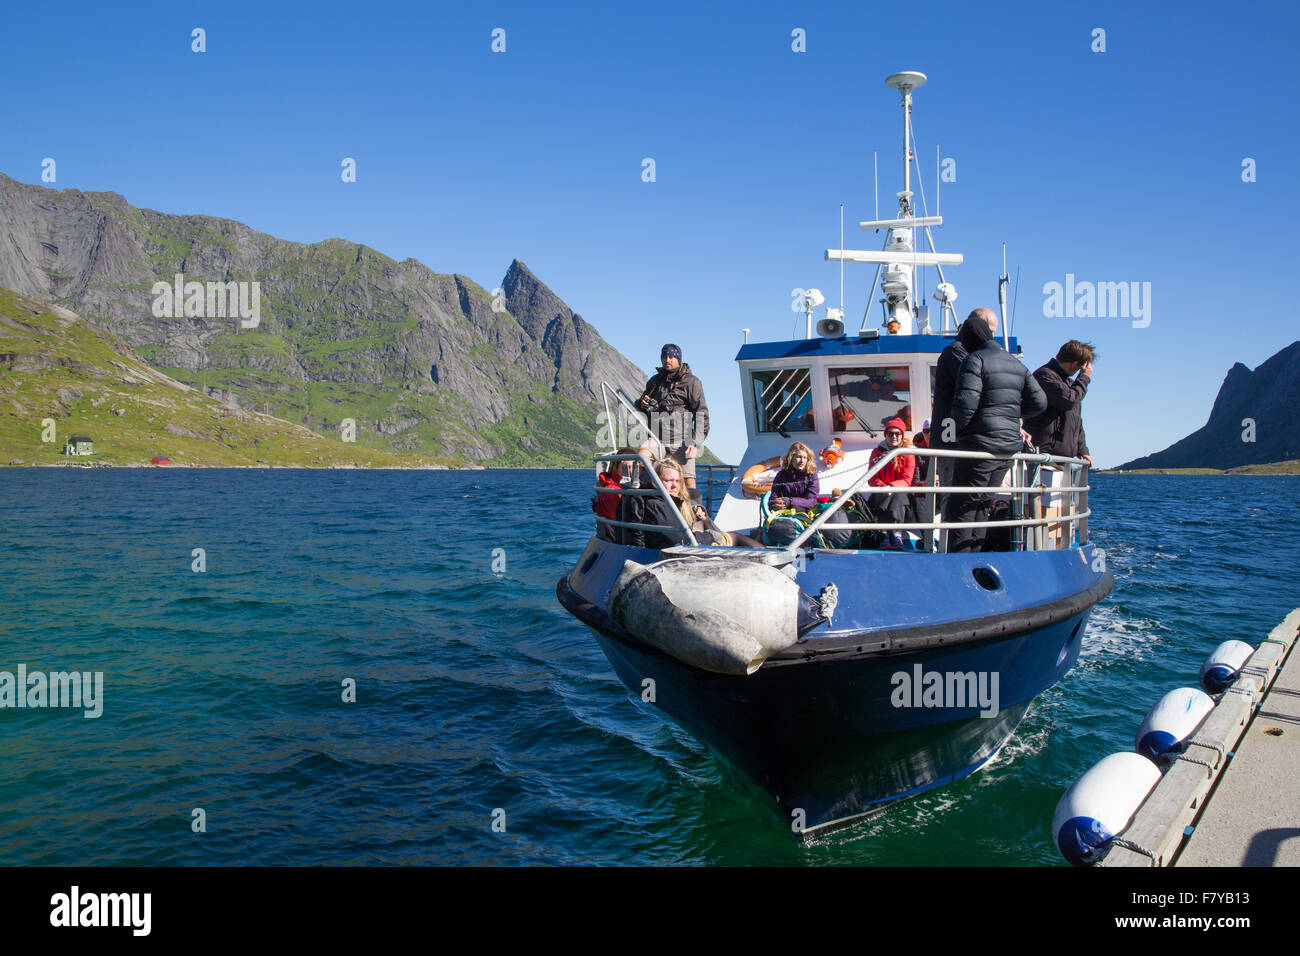 Passenger ferry boat arriving at the jetty of Vindstad on Bunesfjord near Reine - western Lofoten Islands Norway - Stock Image